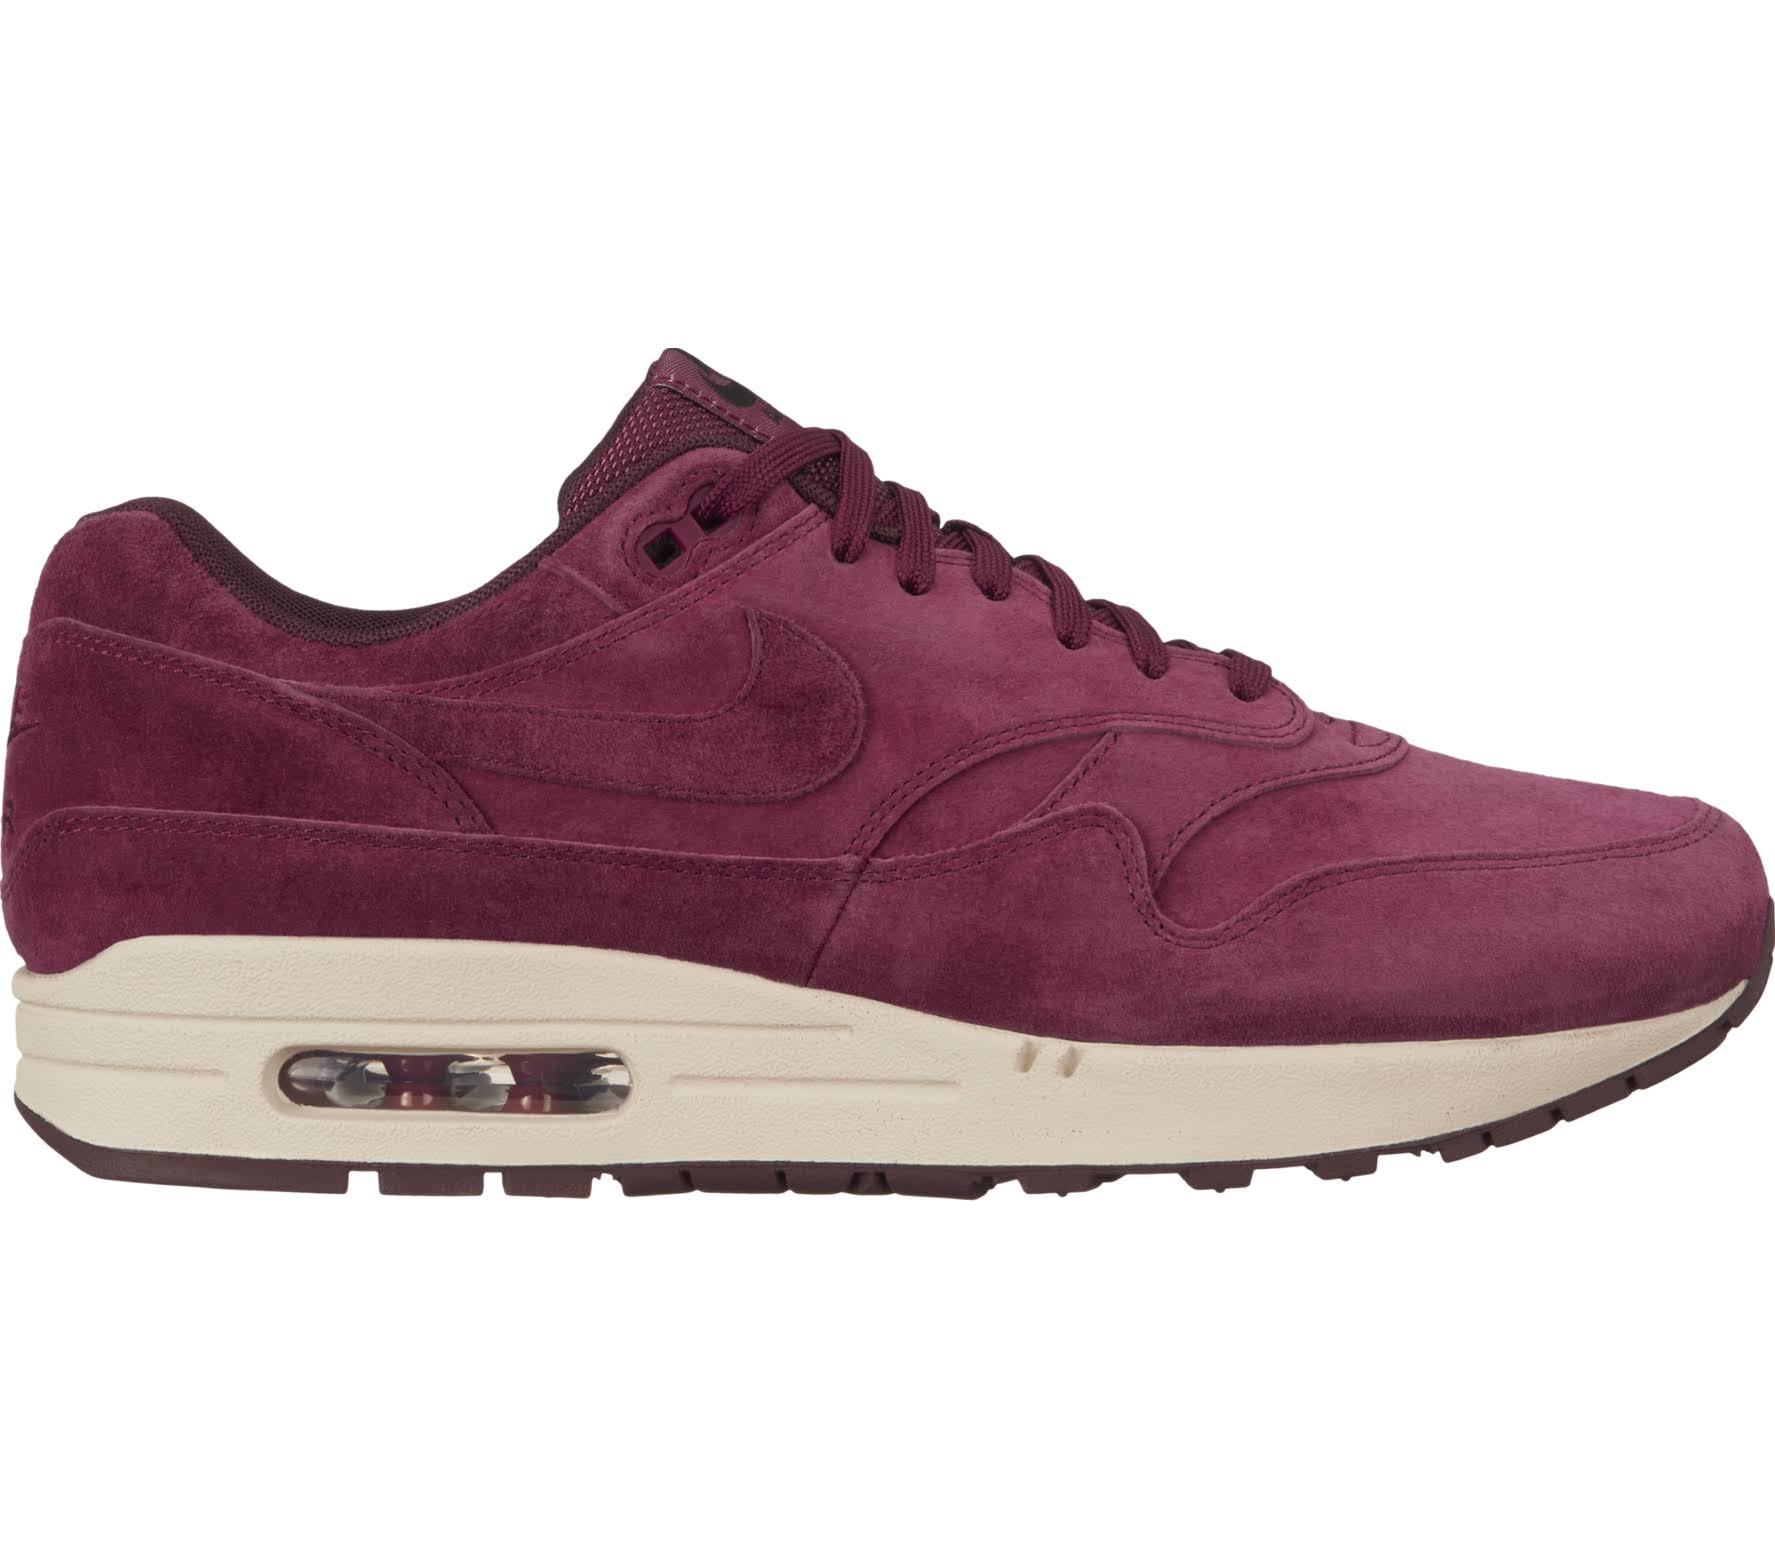 Lila Rot Sneaker 875844 1 In Nike 602 Hochwertige – Air Max w4x1Hq6